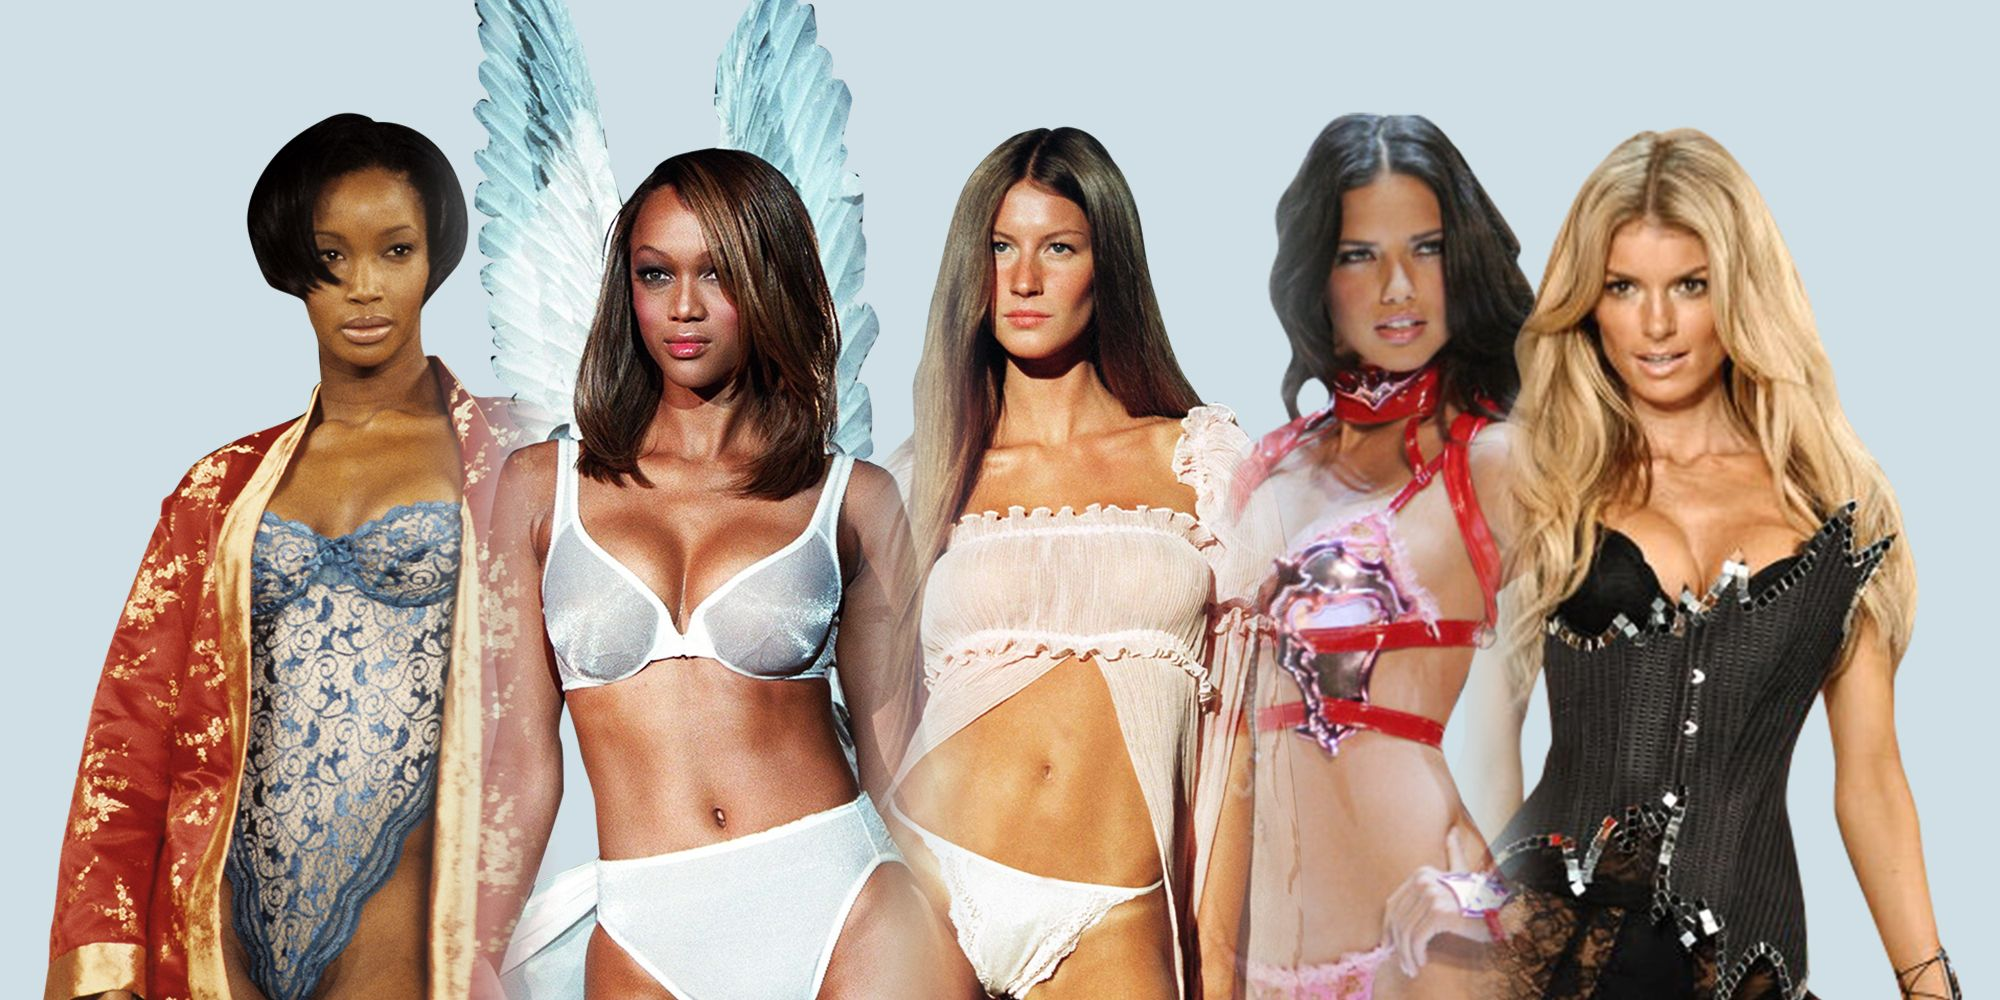 b6027112dfd Victoria s Secret Fashion Show Timeline - Most Controversial Moments ...